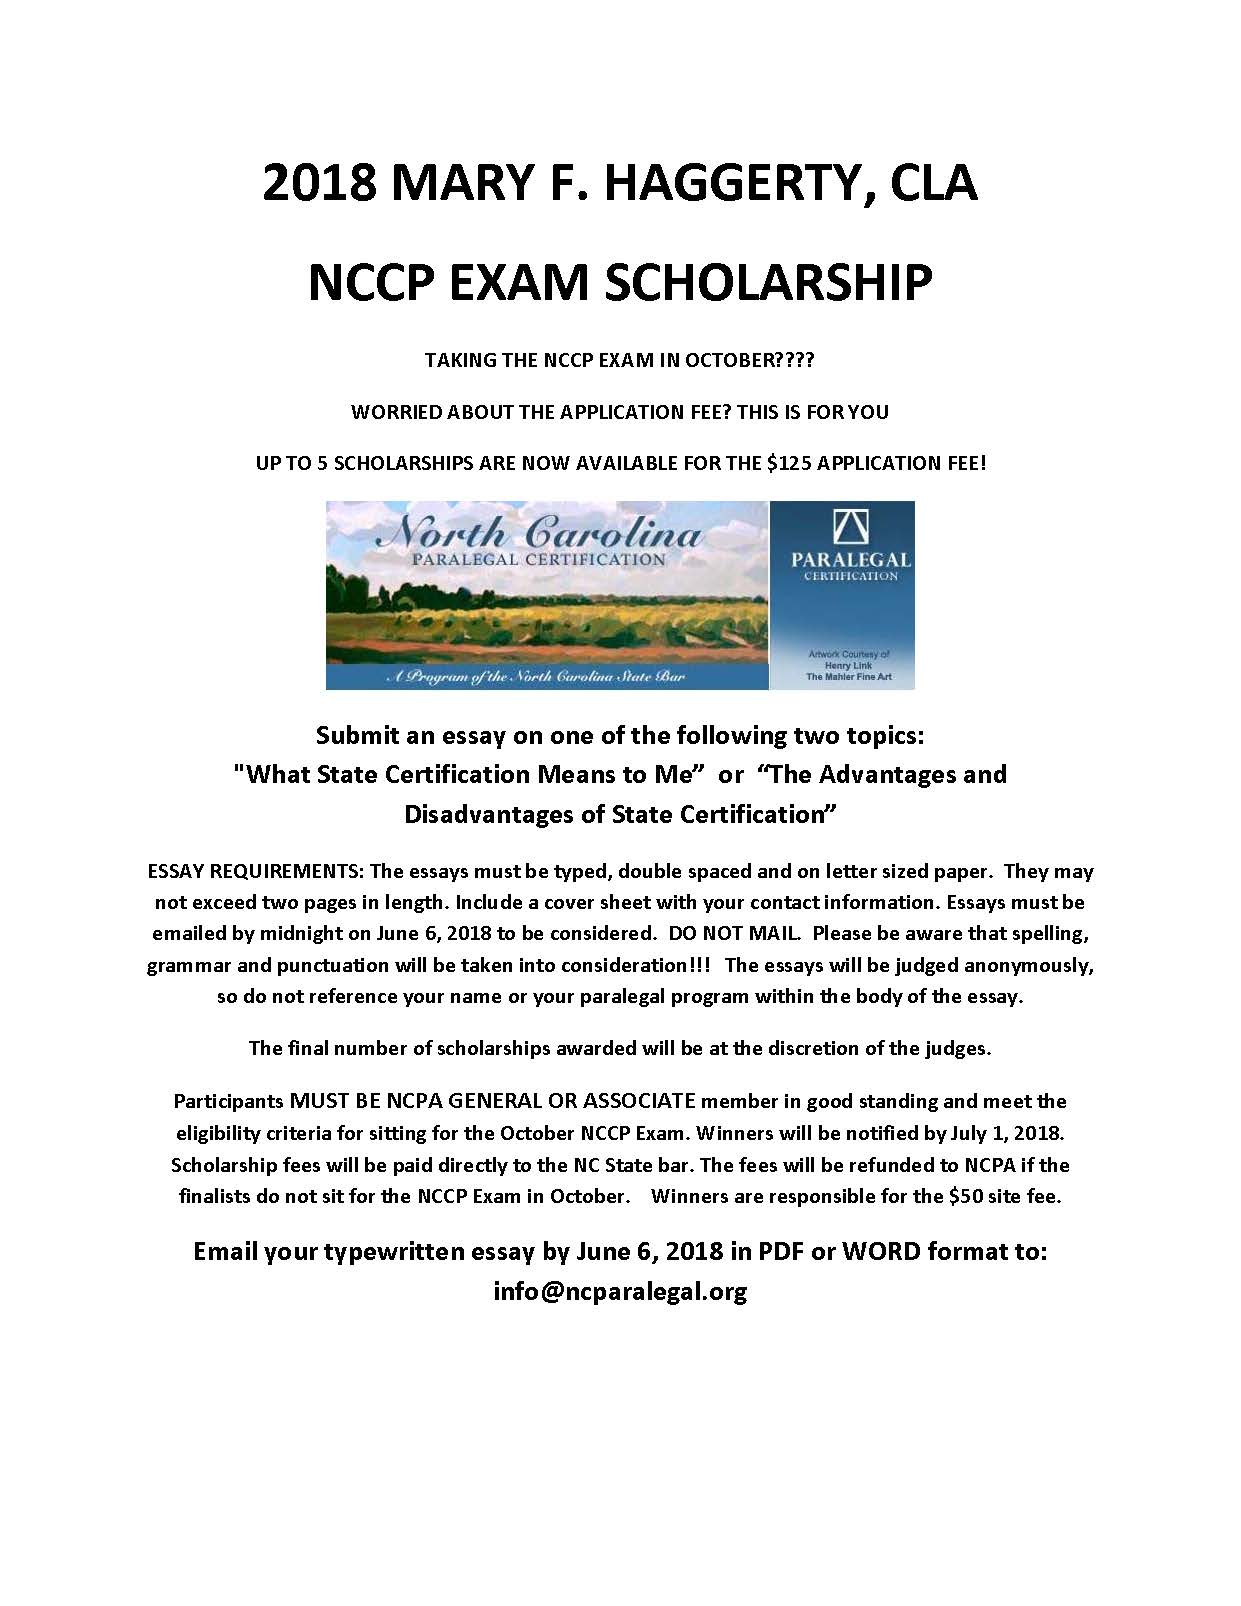 North Carolina Paralegal Association